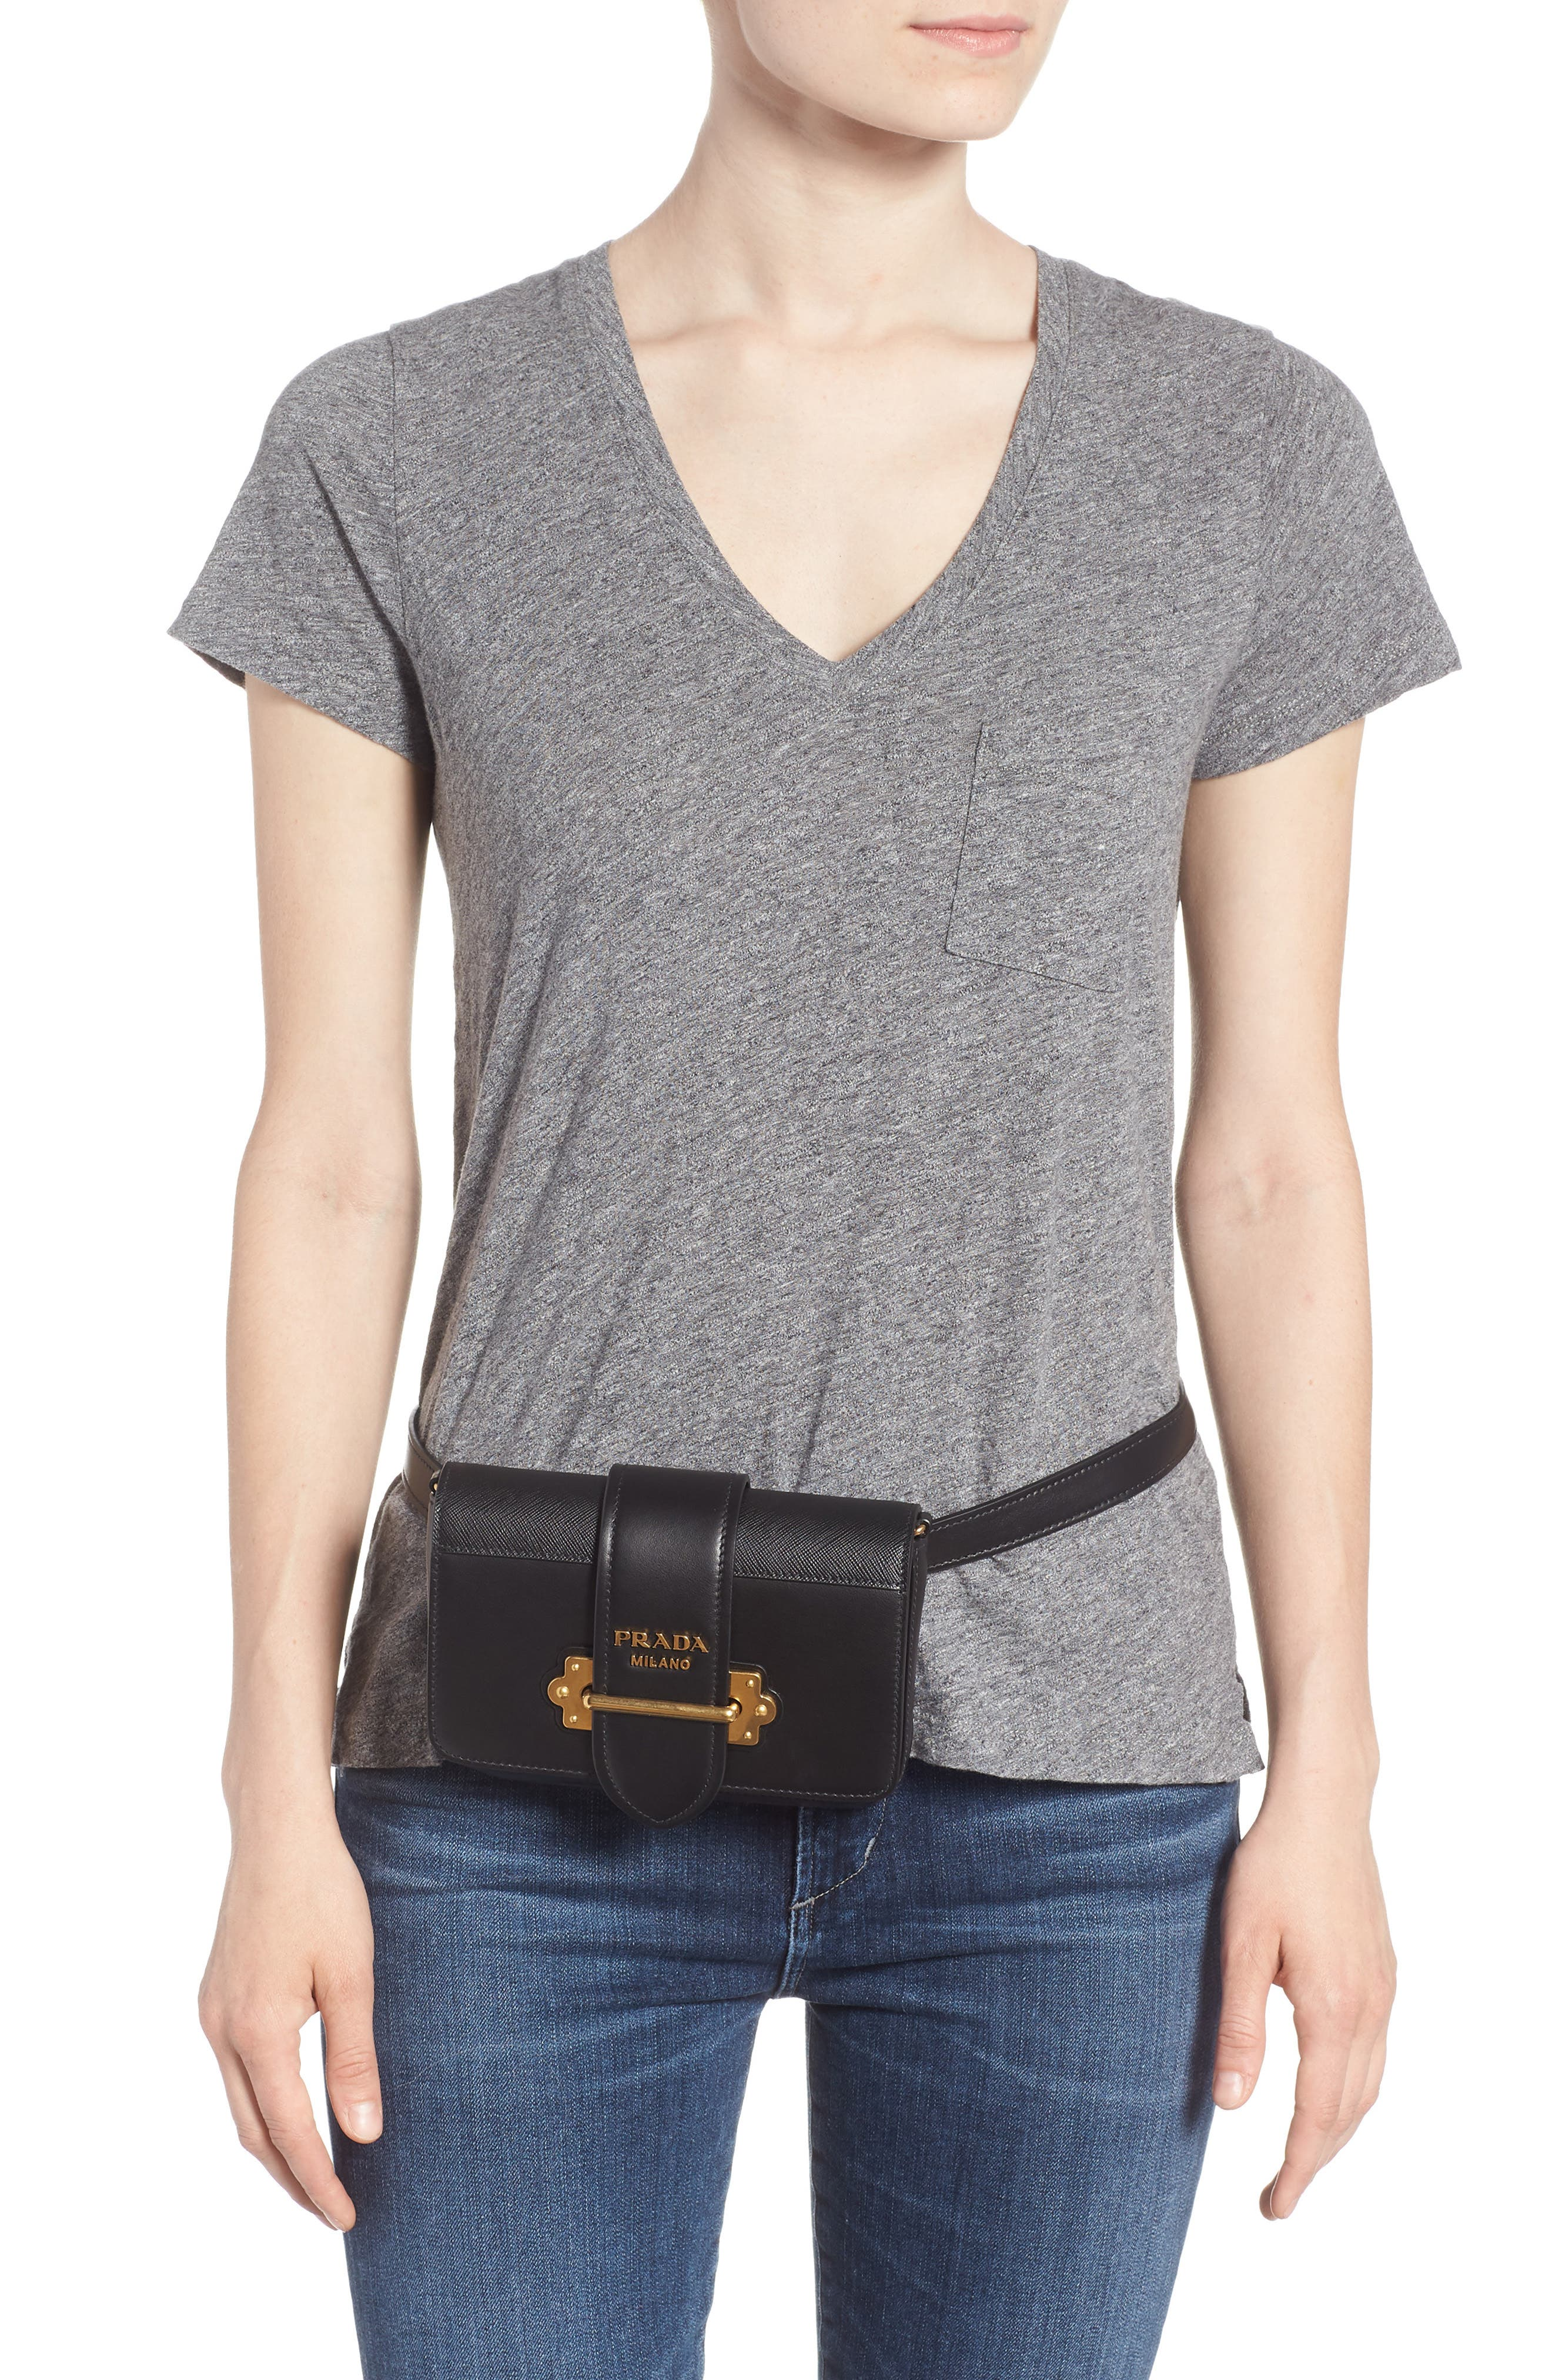 PRADA,                             Cahier Leather Belt Bag,                             Alternate thumbnail 2, color,                             001